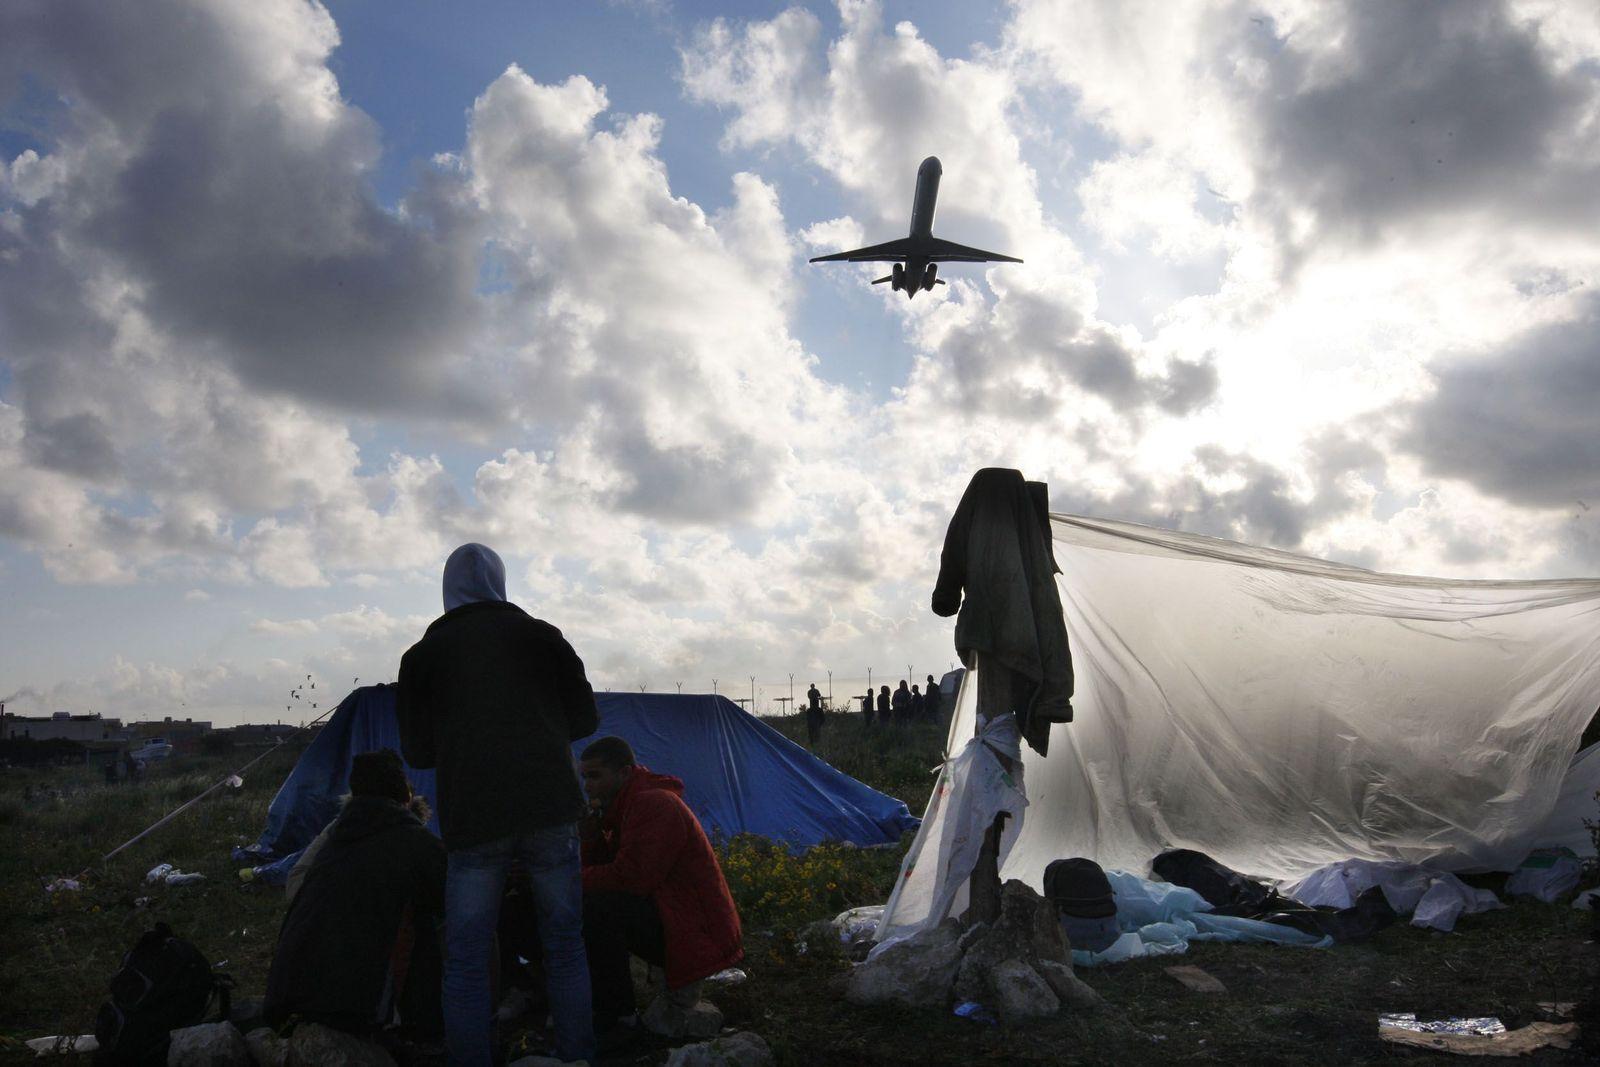 Italien/ Flüchtlinge/ Lampedusa